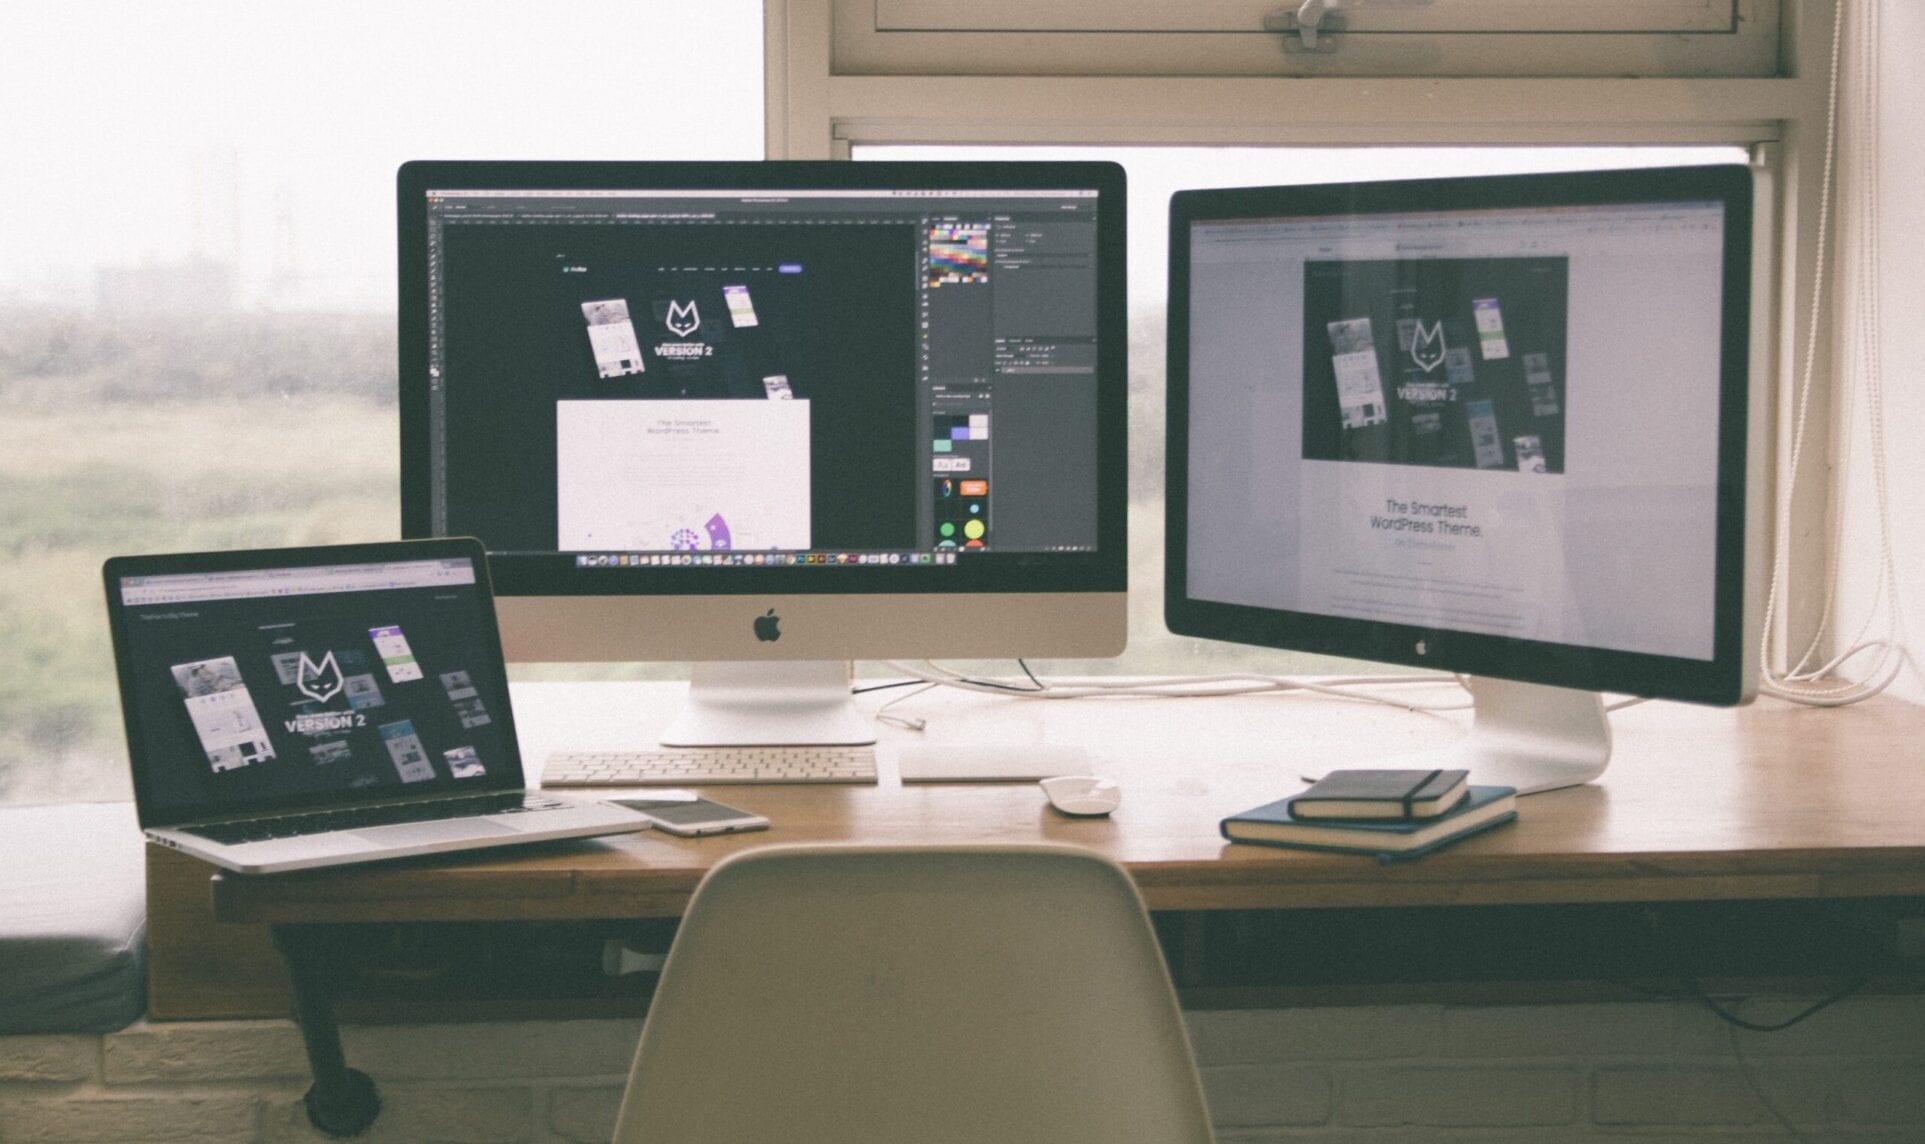 Social Media promotion working though desktops